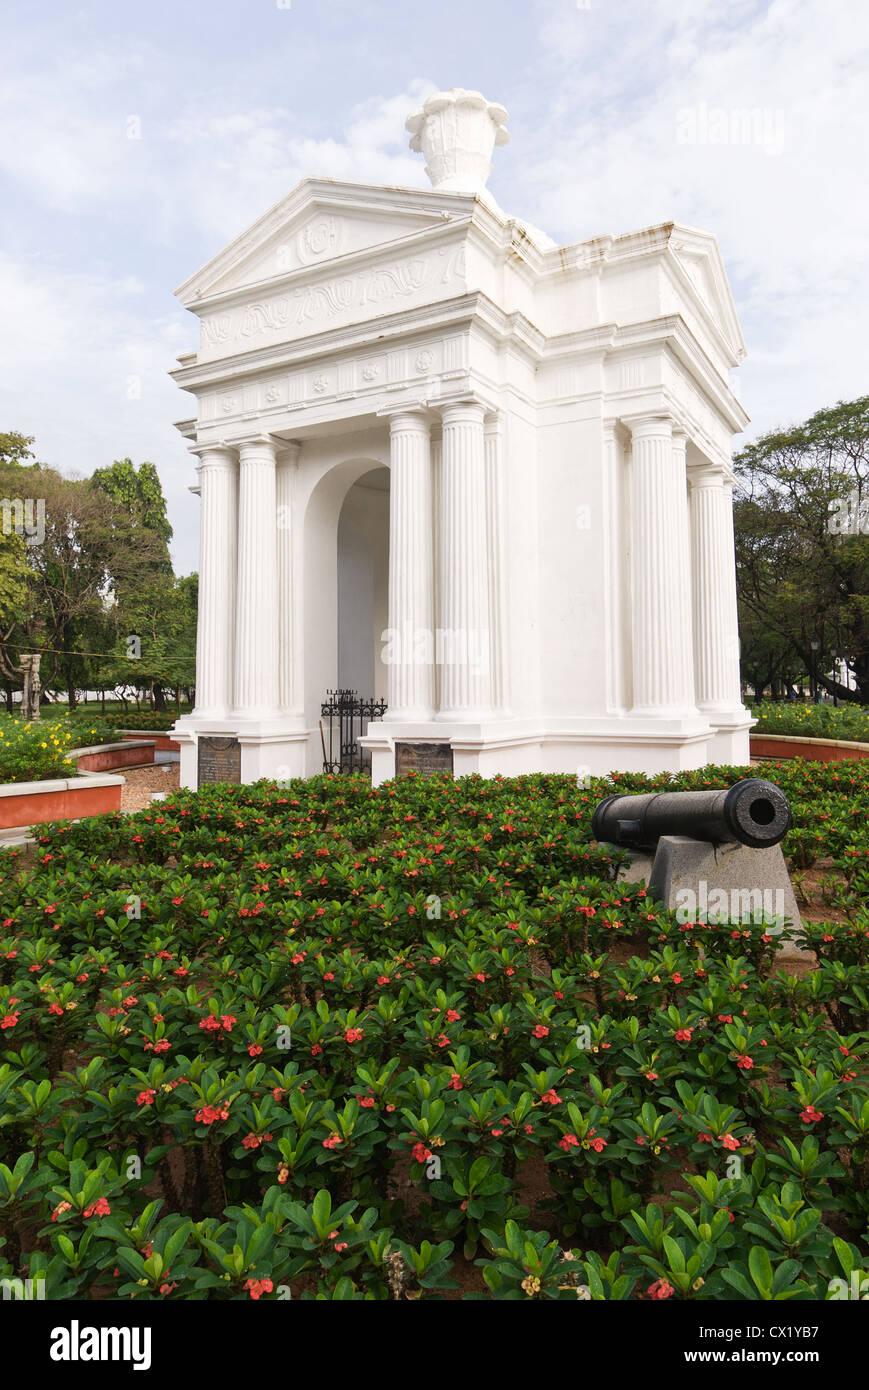 Elk201-4428v Indien, Tamil Nadu, Pondicherry, Regierungsplatz Stockbild